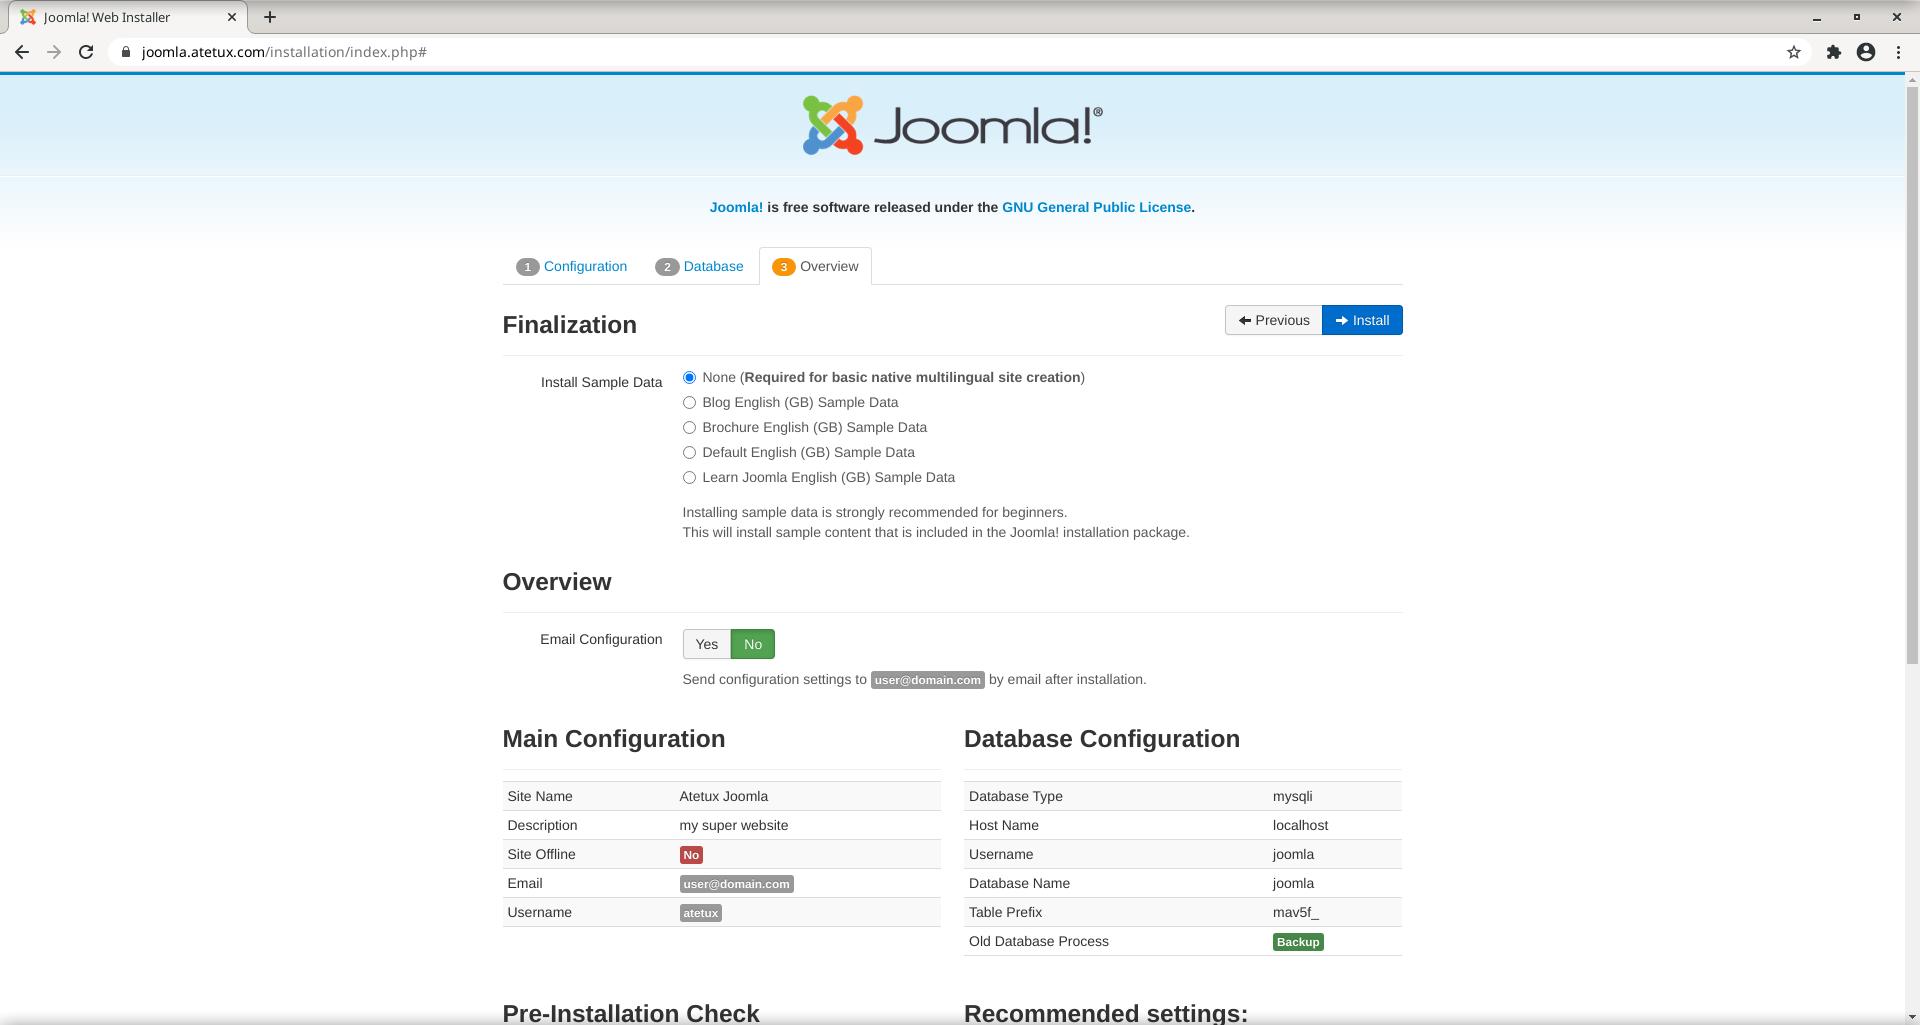 joomla overview instalation